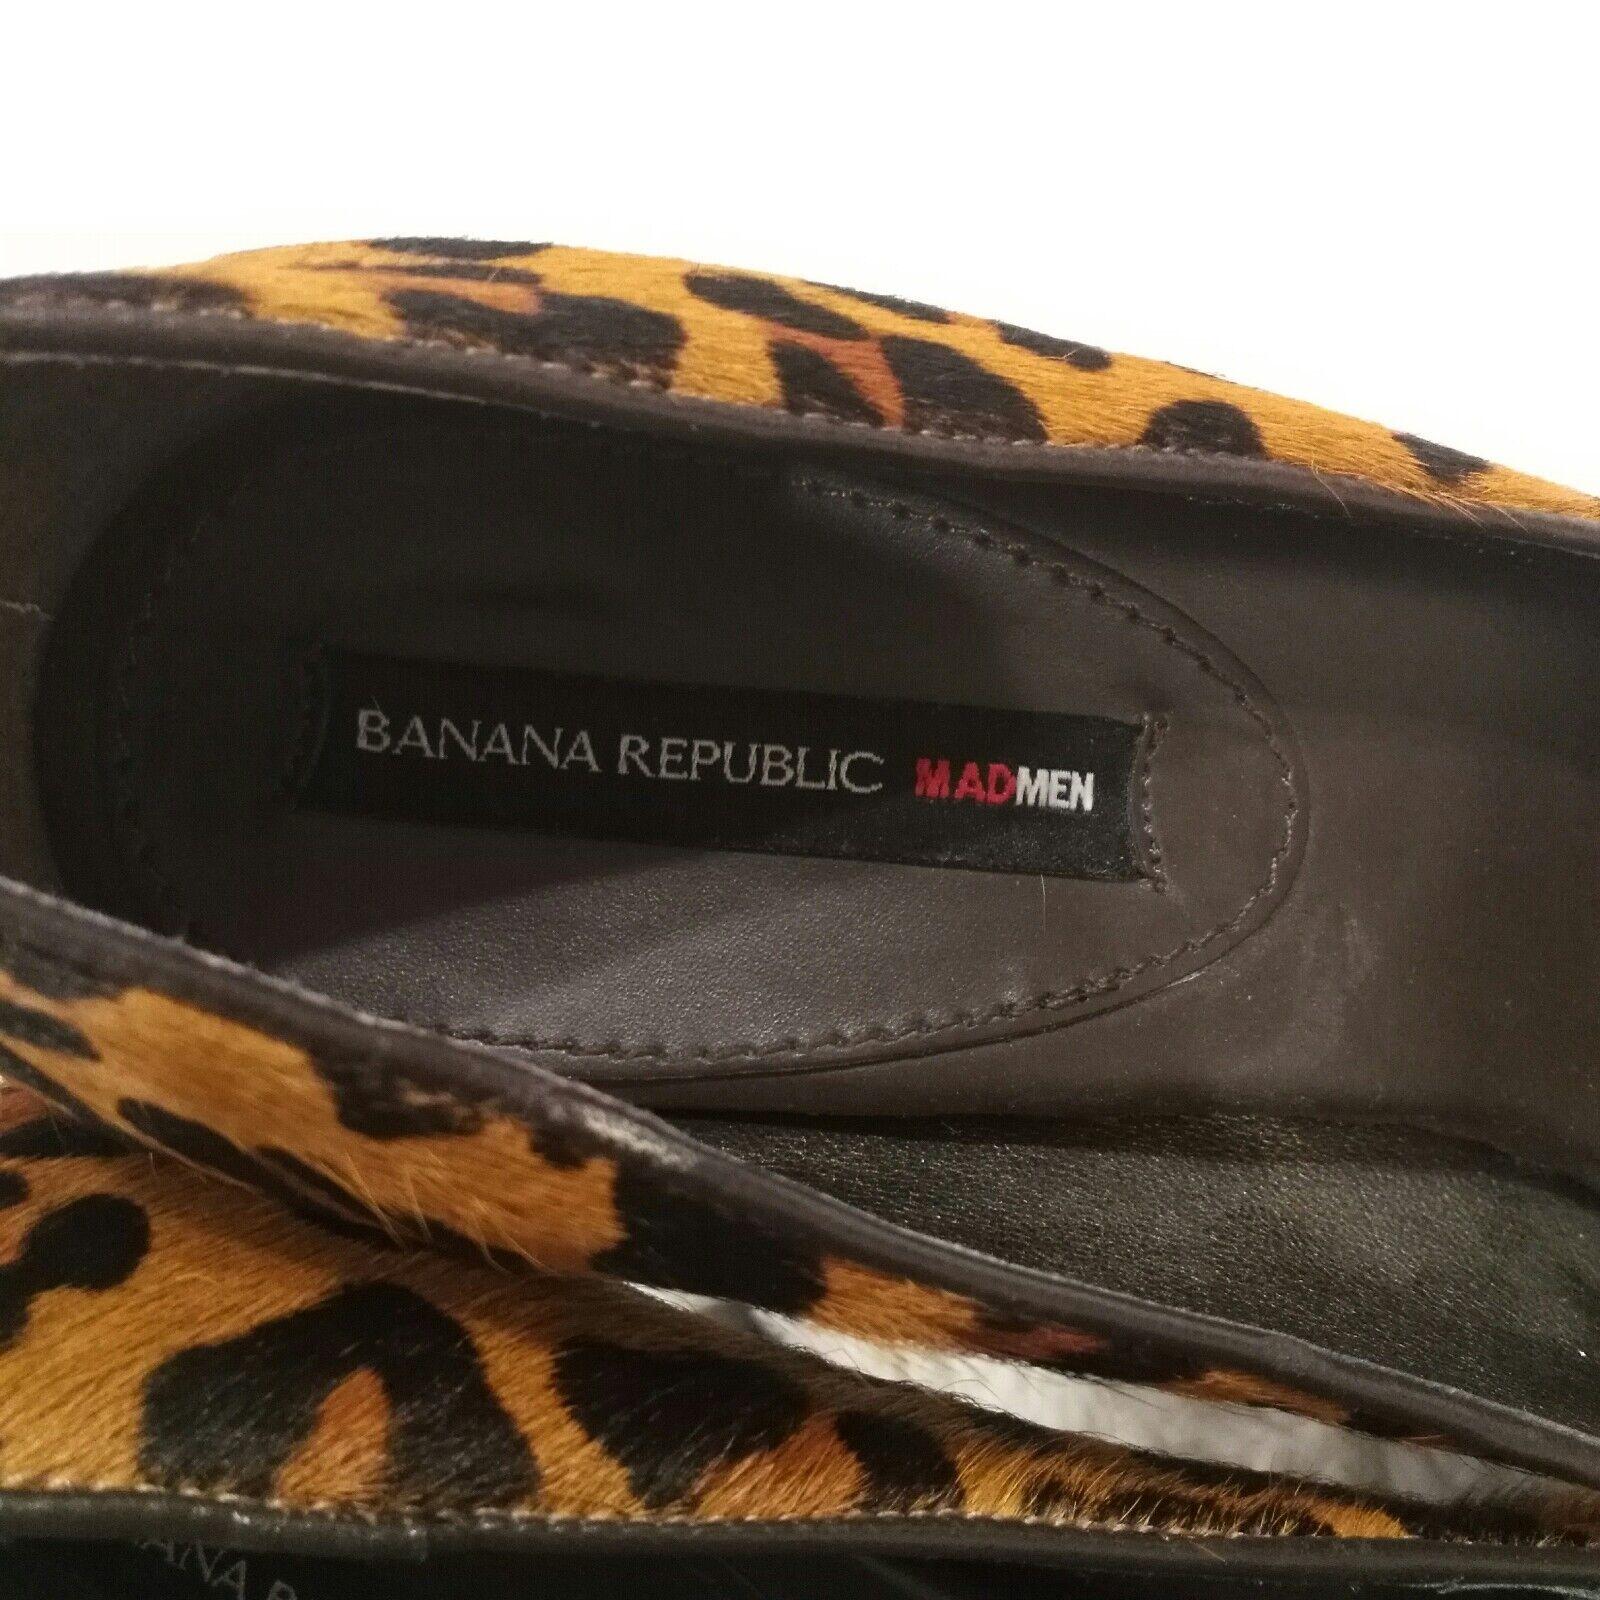 Banana Republic Leopard Print Heels Cow Hair Pumps Heels Print Größe 7.5 Animal Print mad men 4166c3